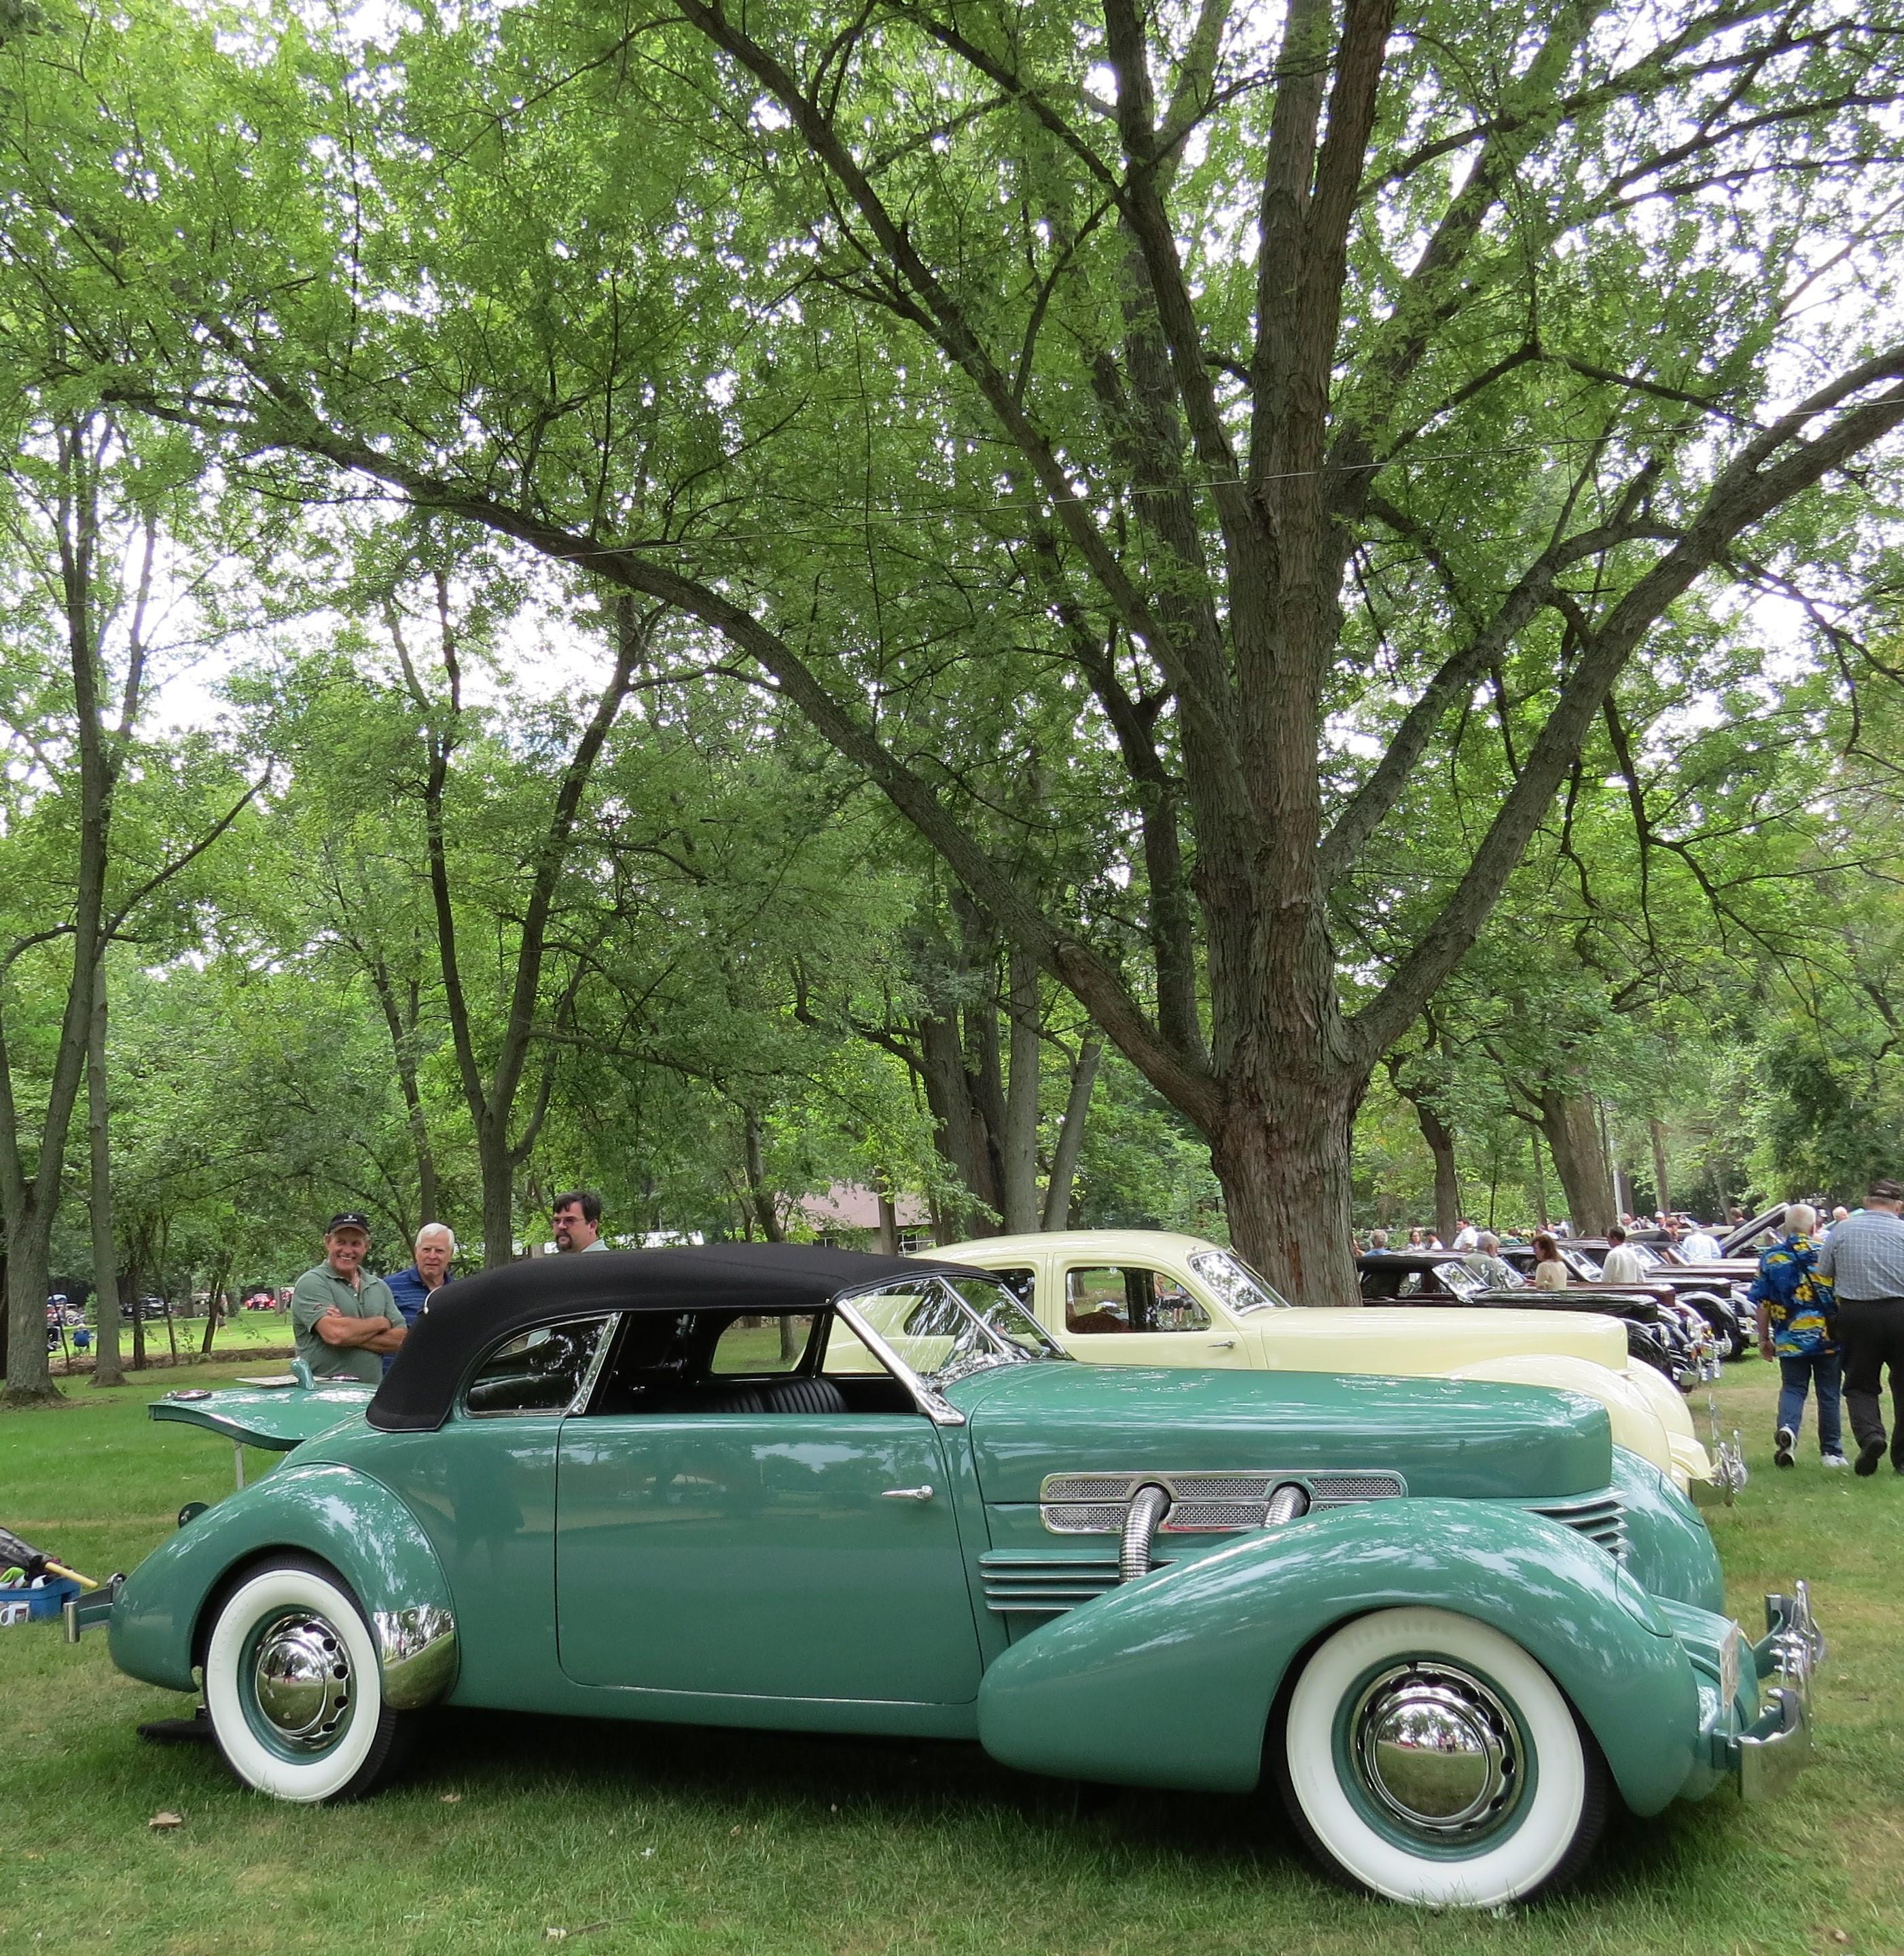 Day 138 Old Auburn. Old Cars